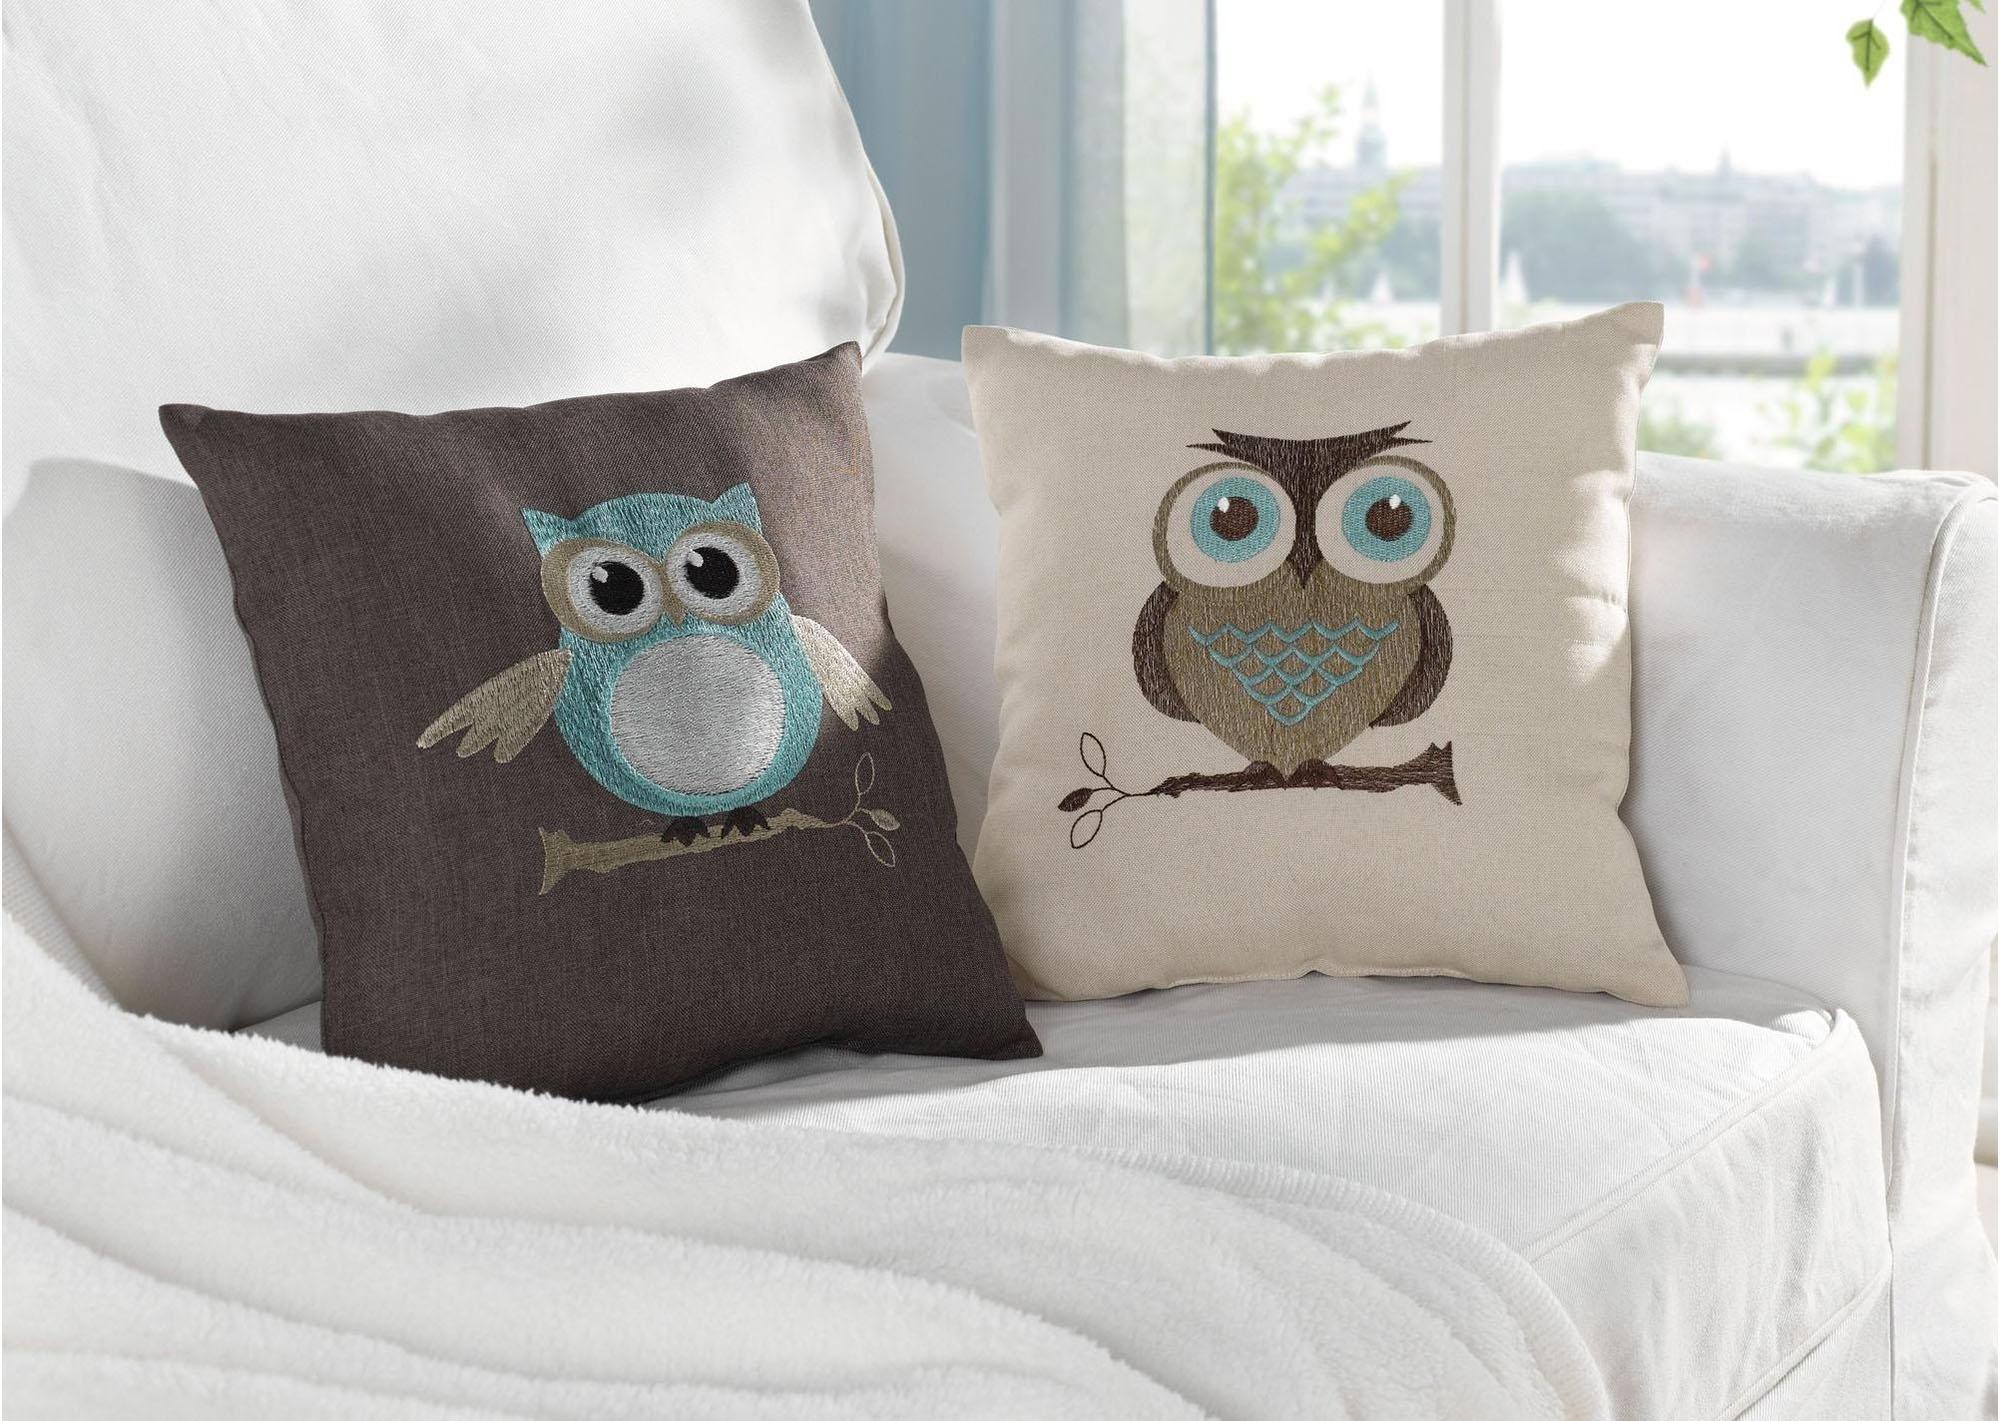 Декоративные подушки с совами